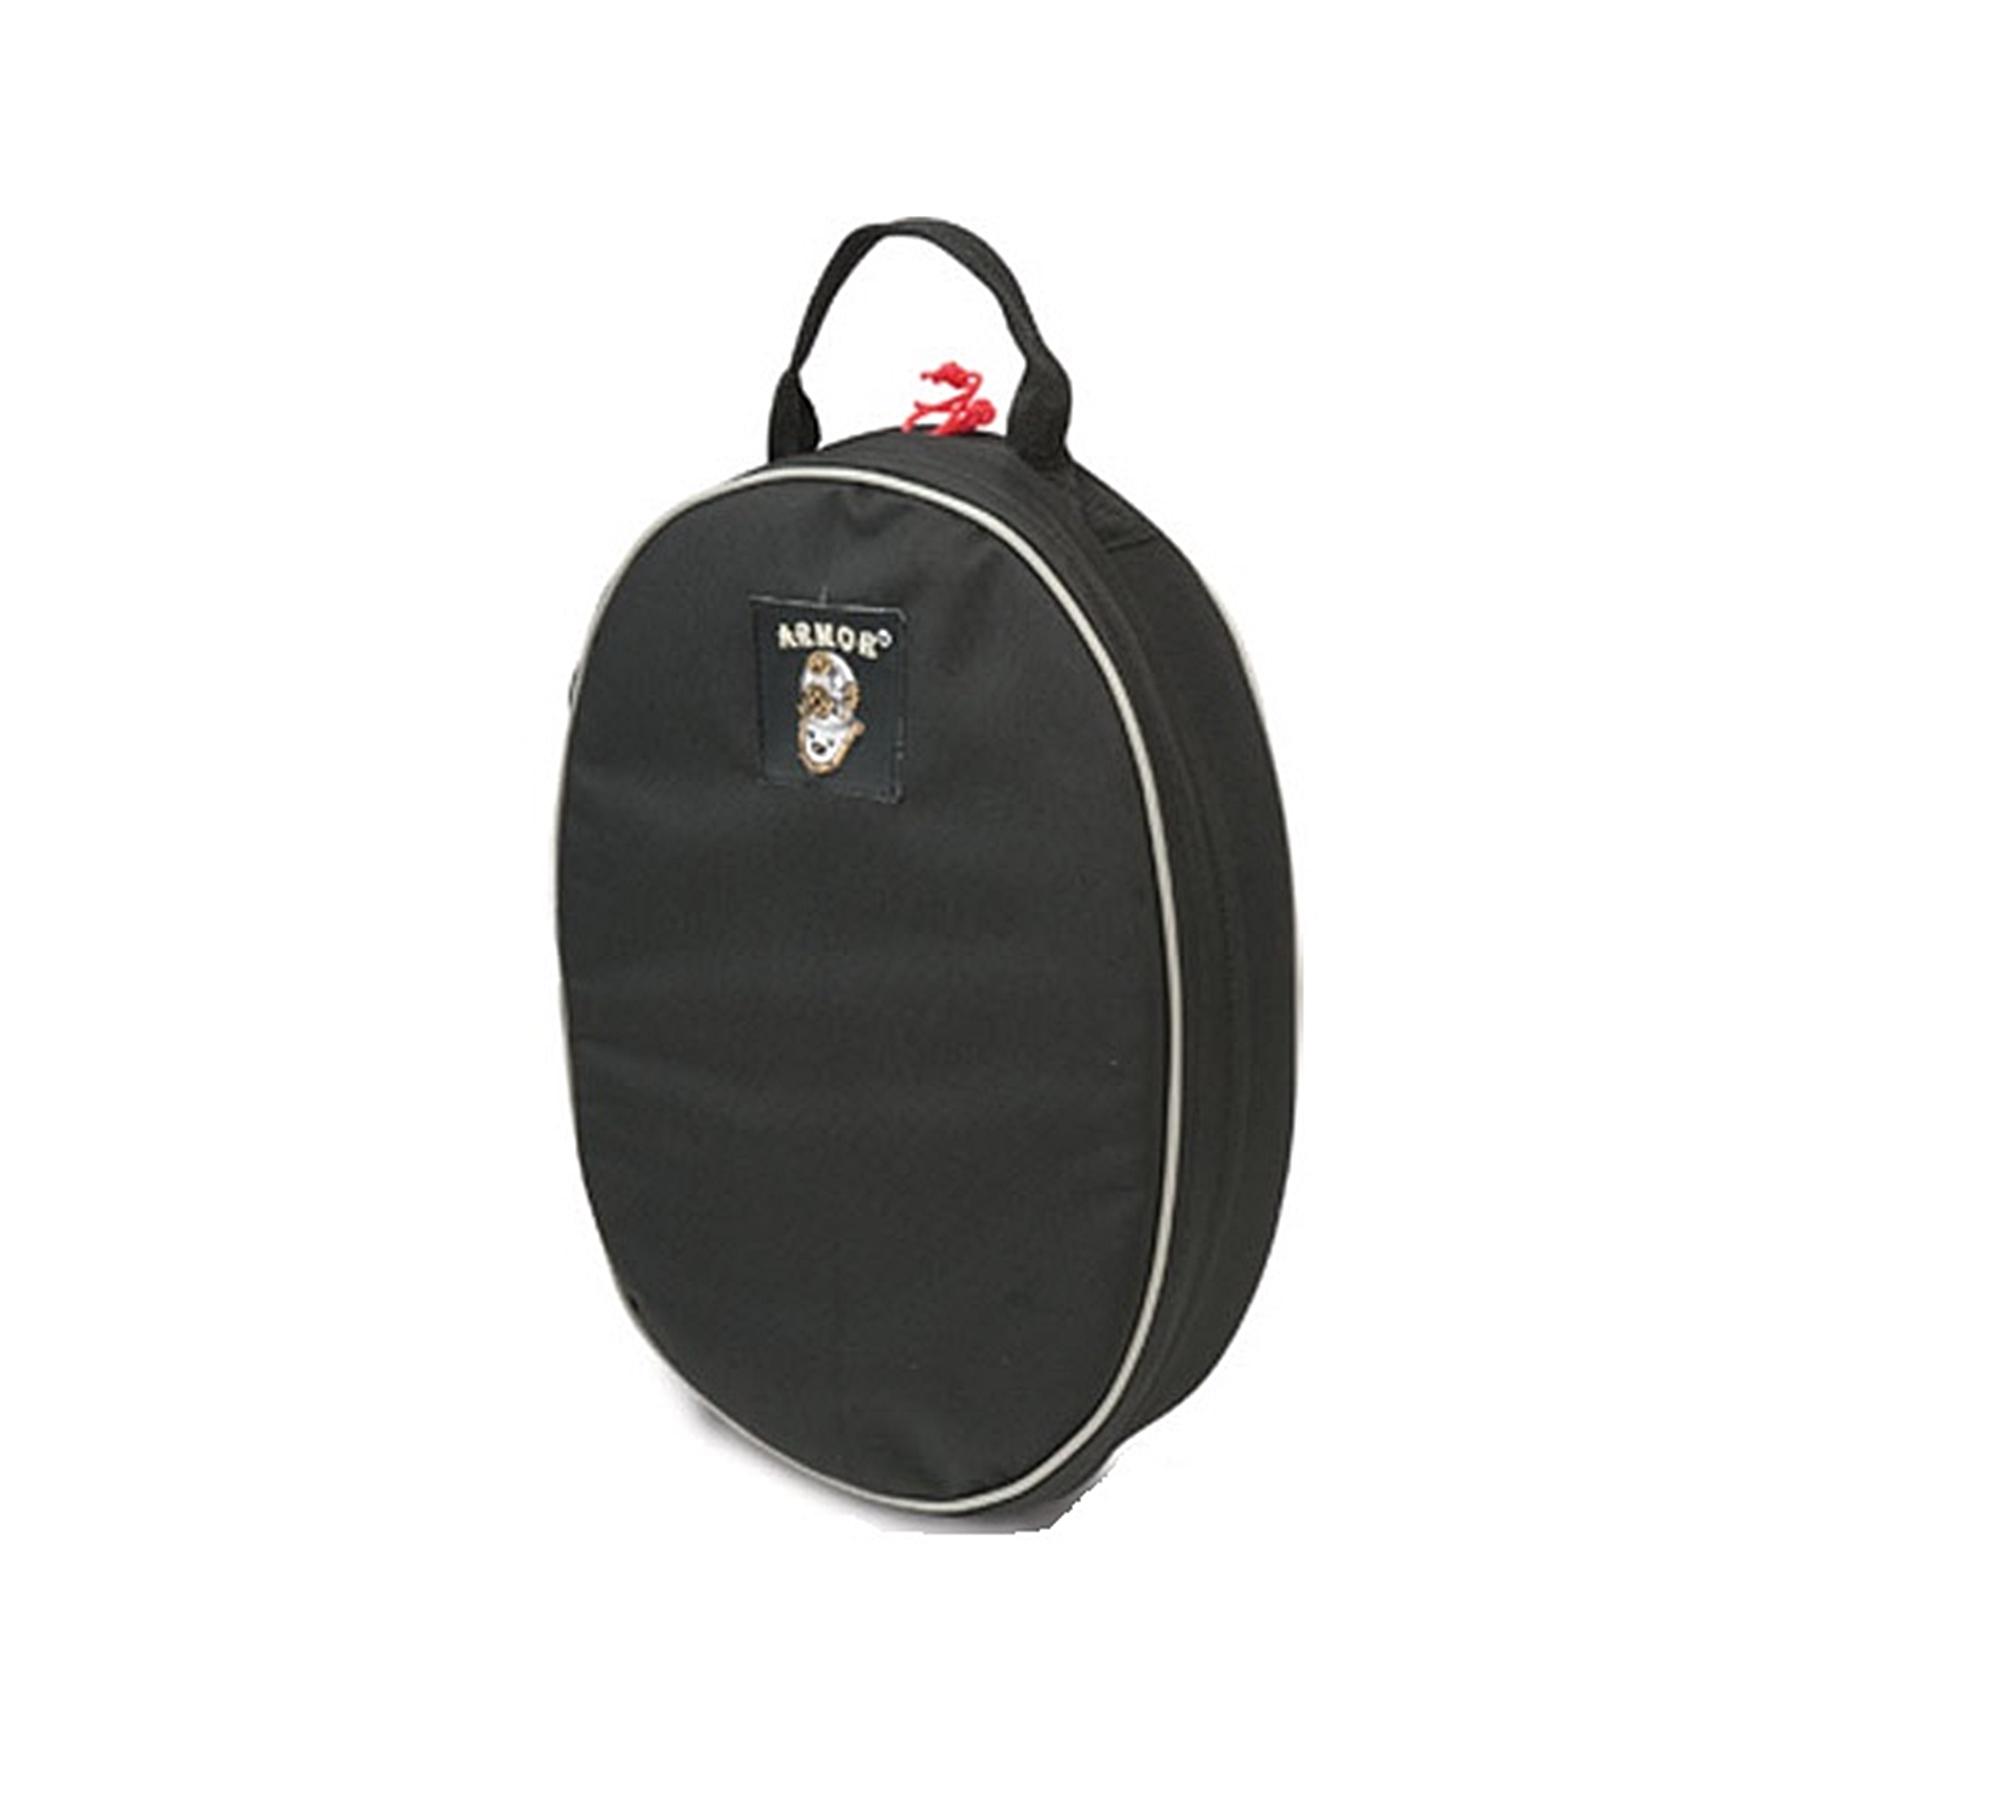 Armor Bags Regulator Medium Bag 17x12x4 Black